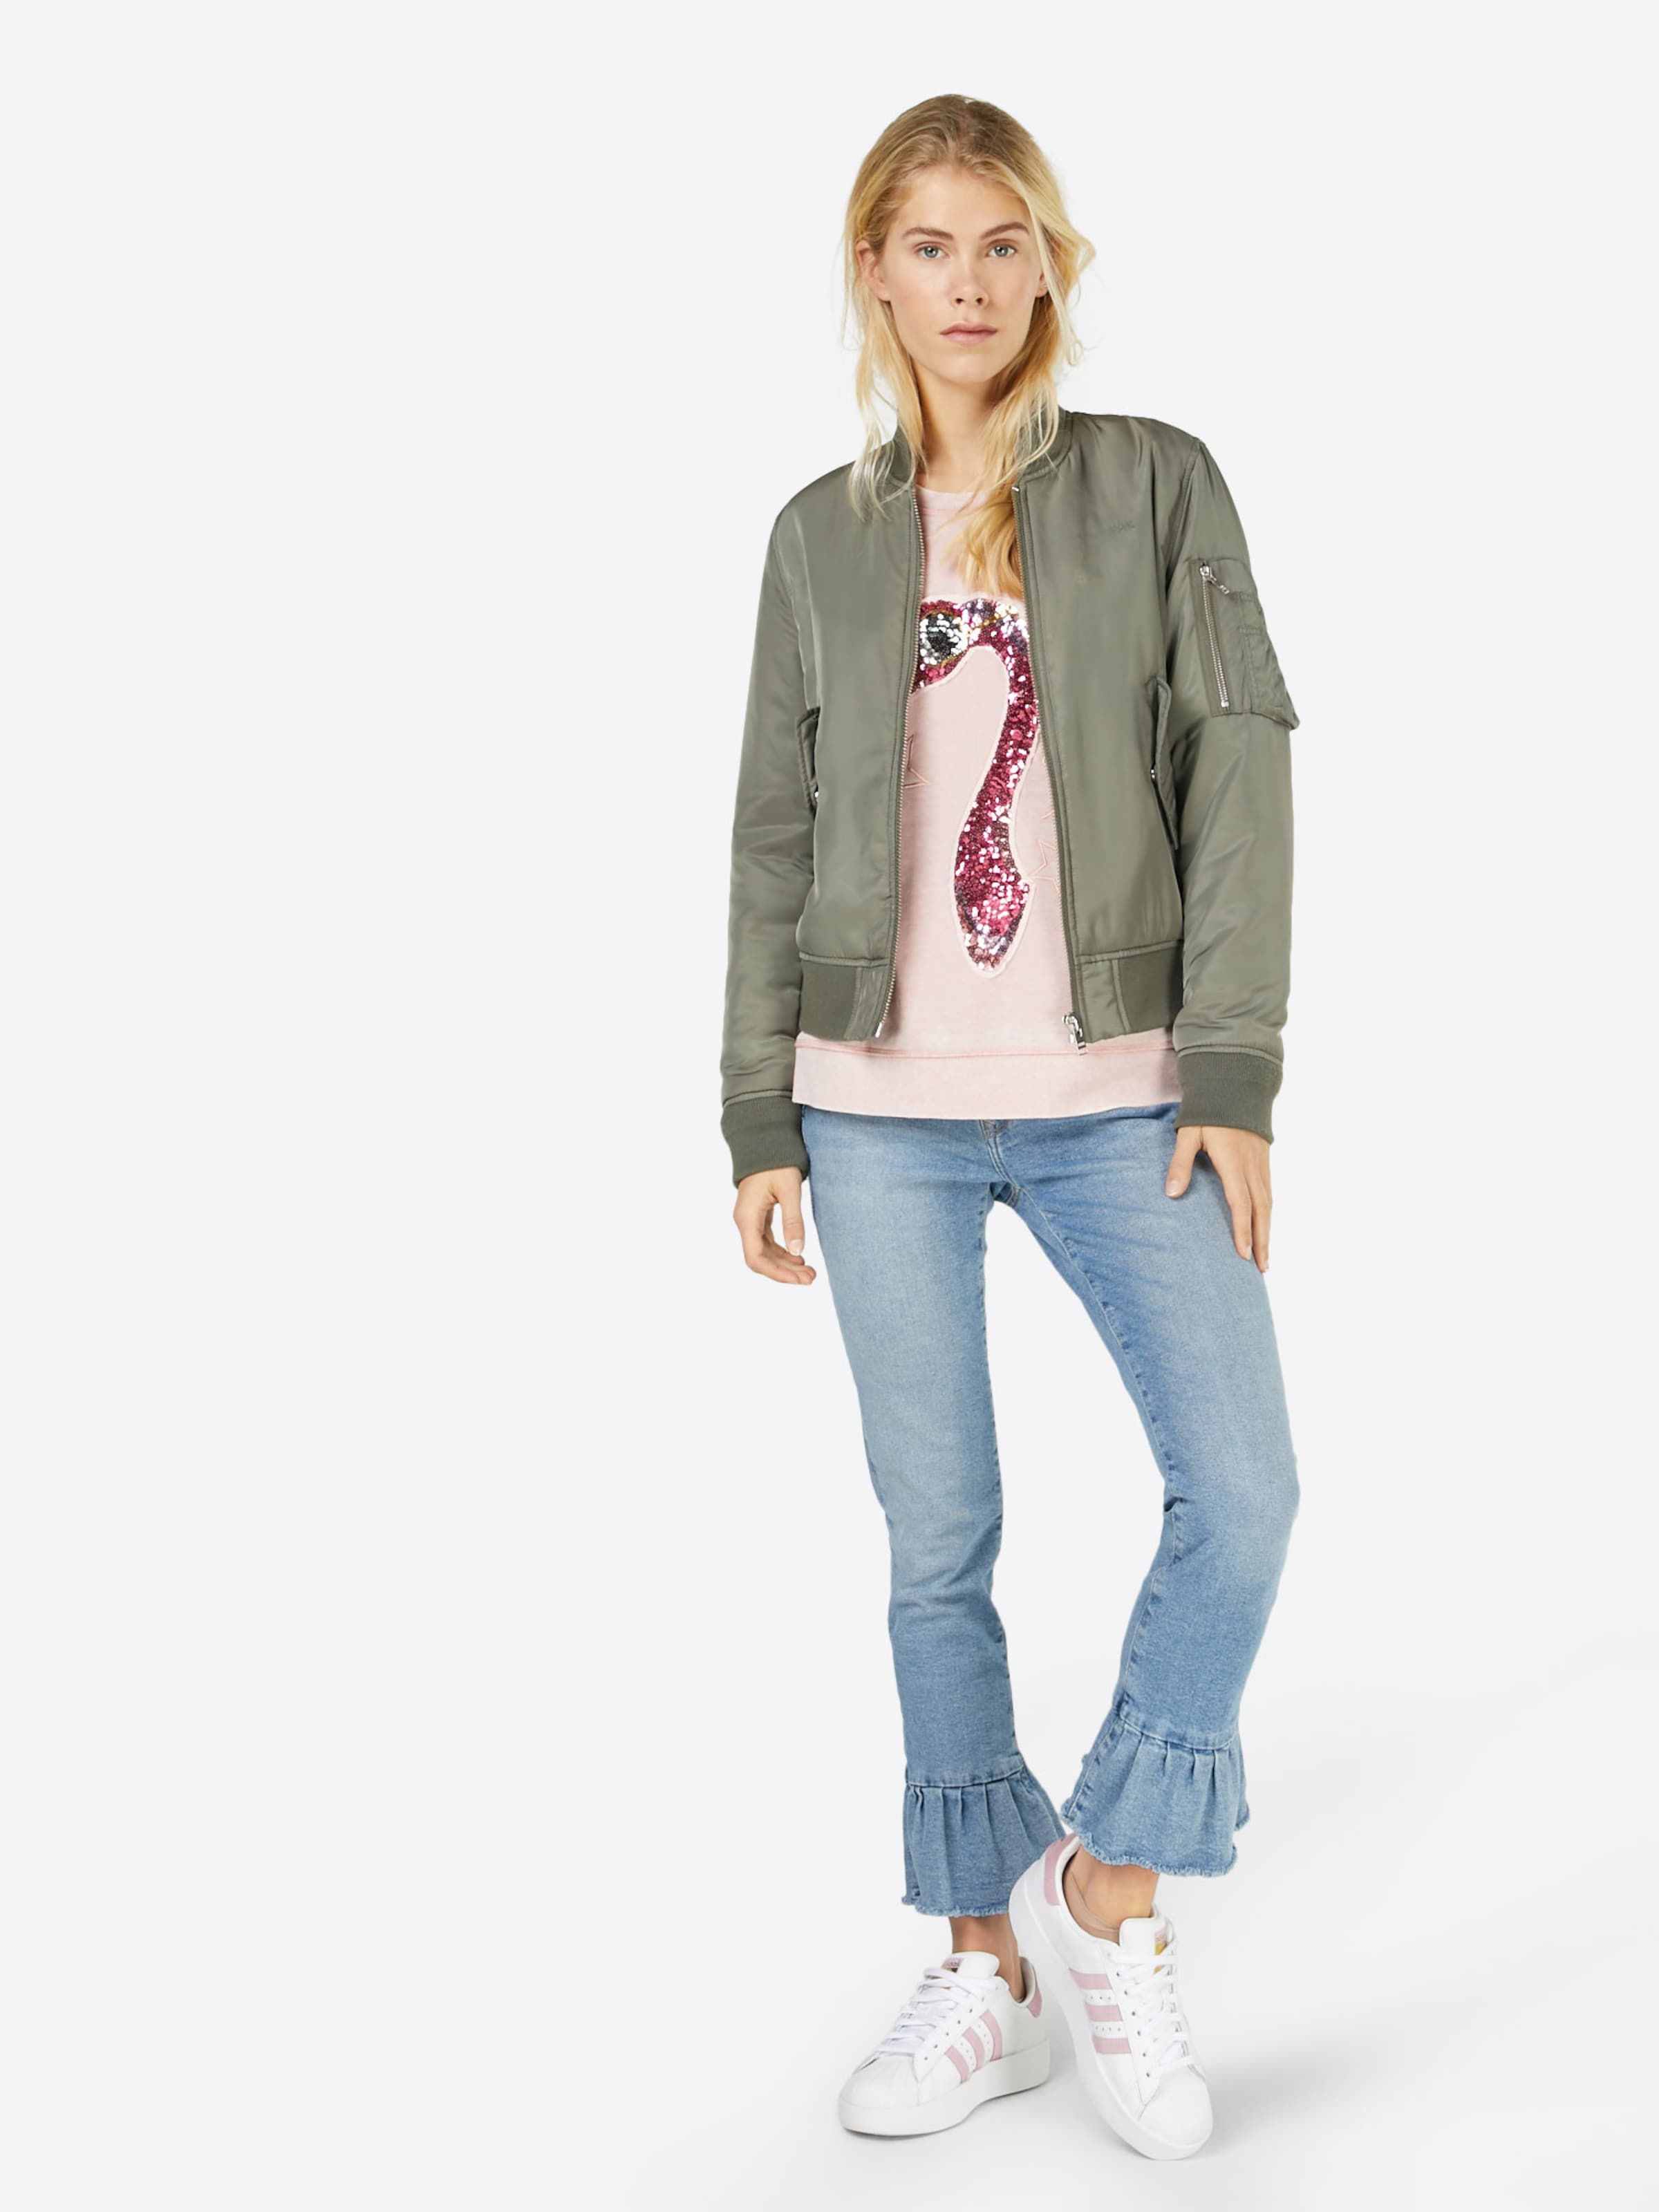 LIEBLINGSSTÜCK Pullover 'Chiara' Günstiger Online-Shop Billig Verkaufen Hochwertige z1YbCmFpDo